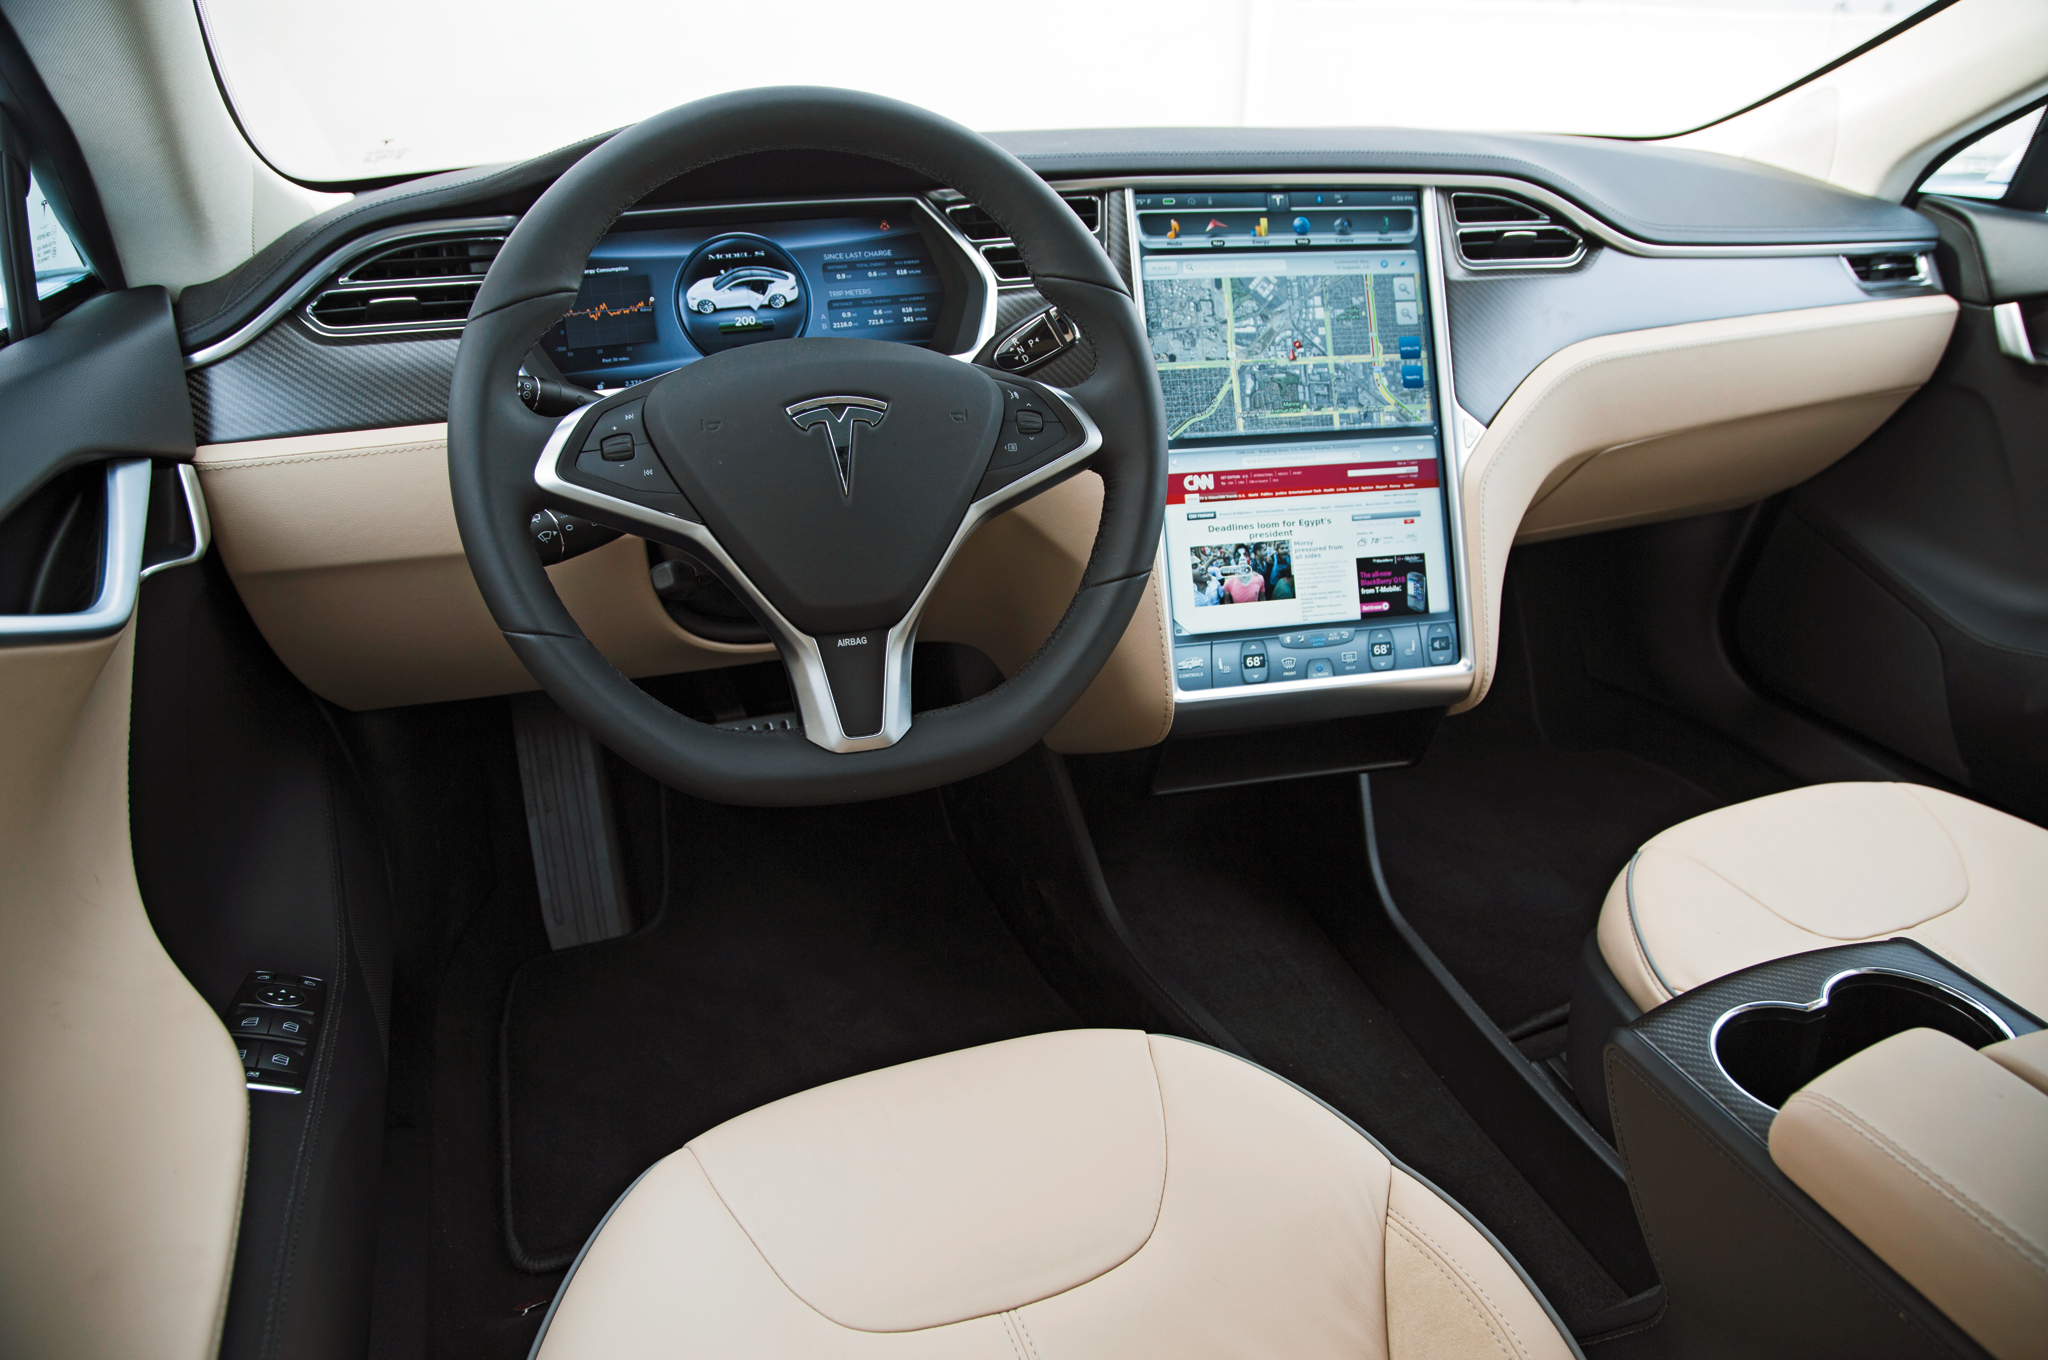 Tesla Car Model X Interior - Tesla Image